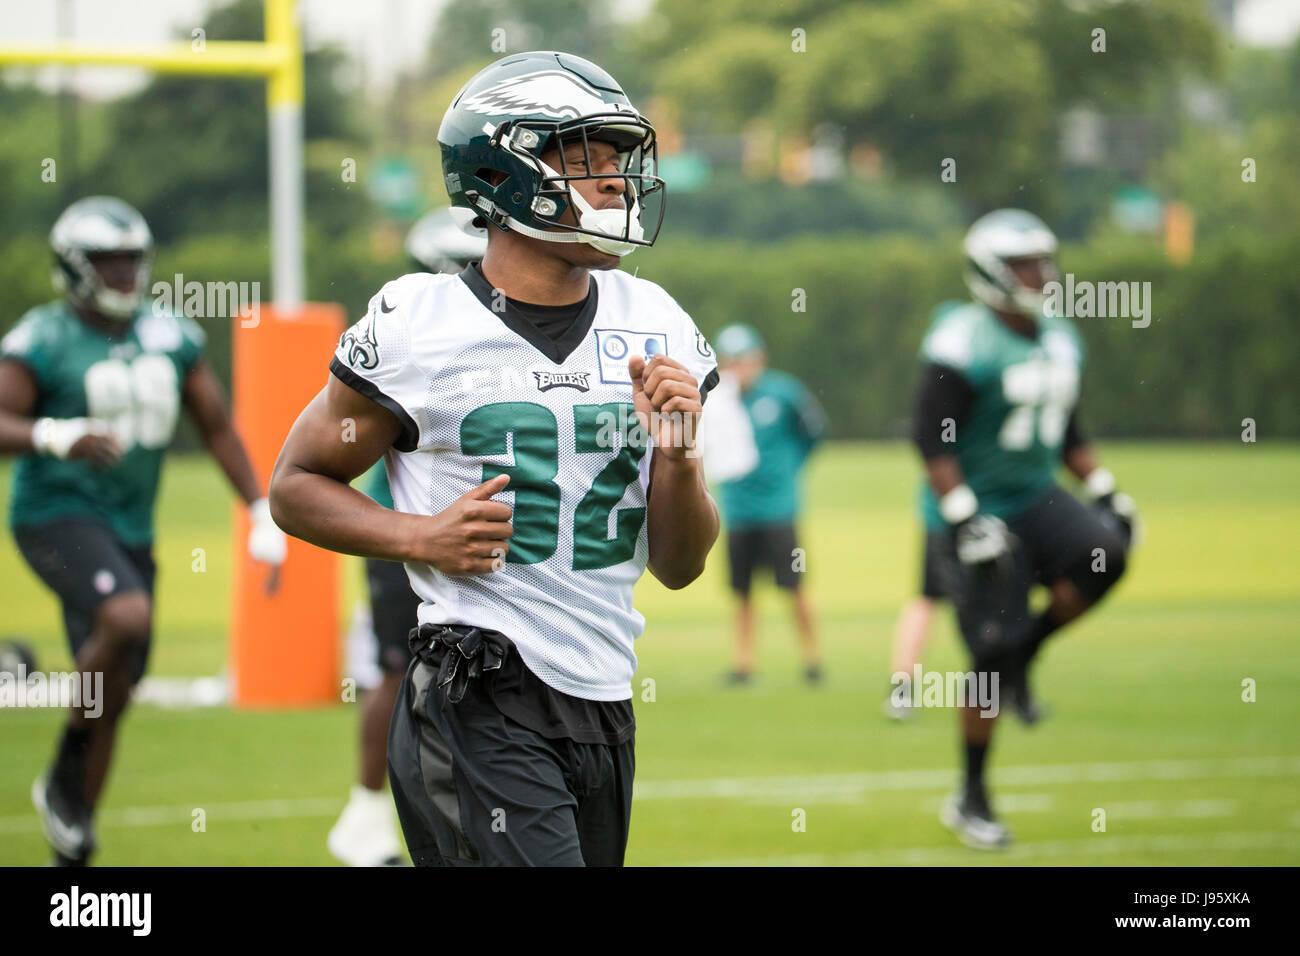 Philadelphia, Pennsylvania, USA. 5th June, 2017. Philadelphia Eagles cornerback Rasul Douglas (32) in action during Stock Photo